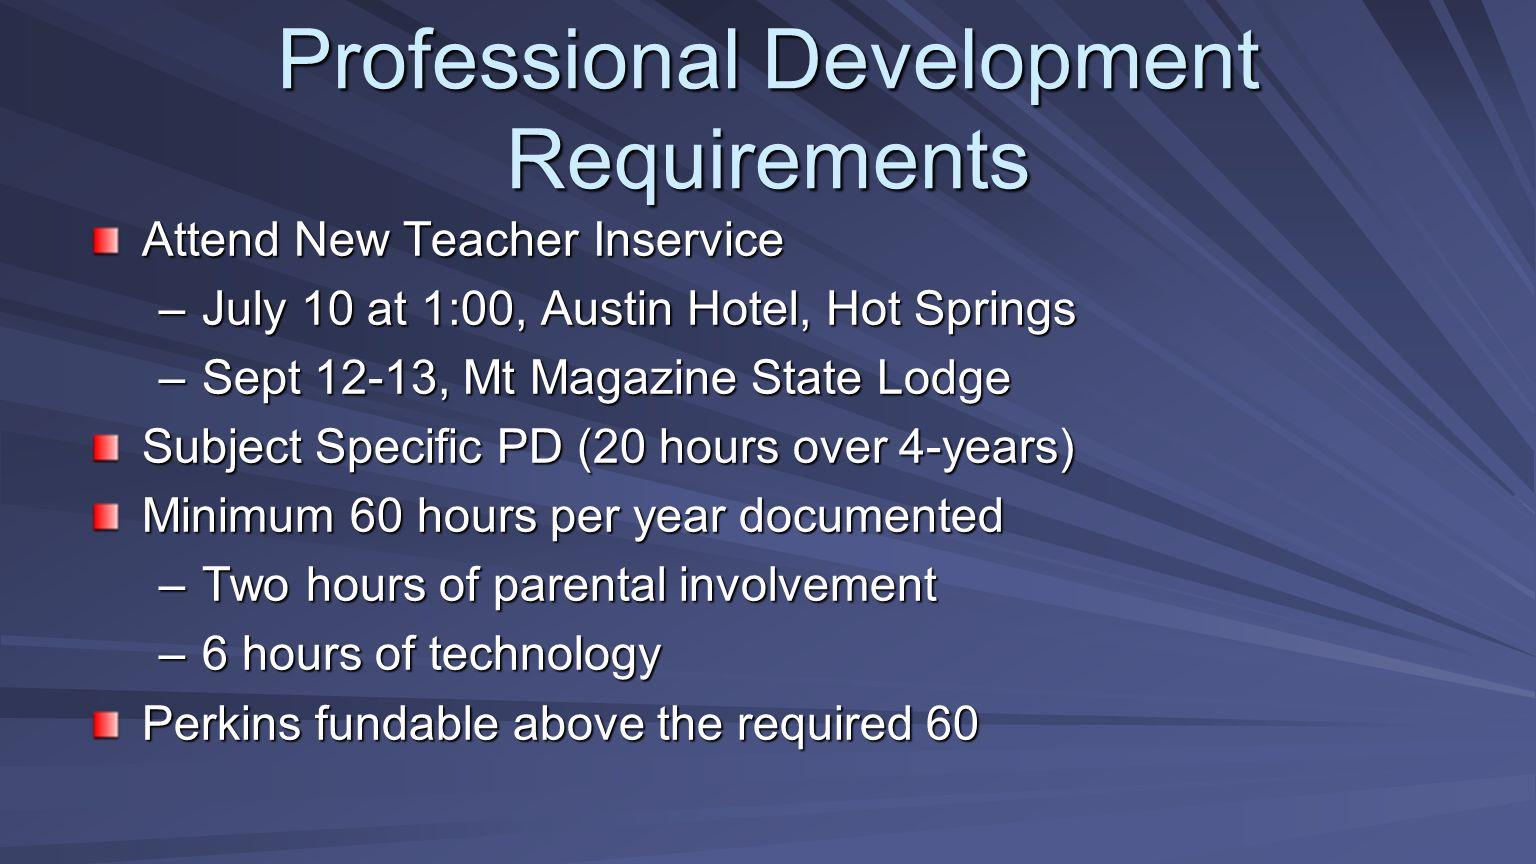 Professional Development Requirements